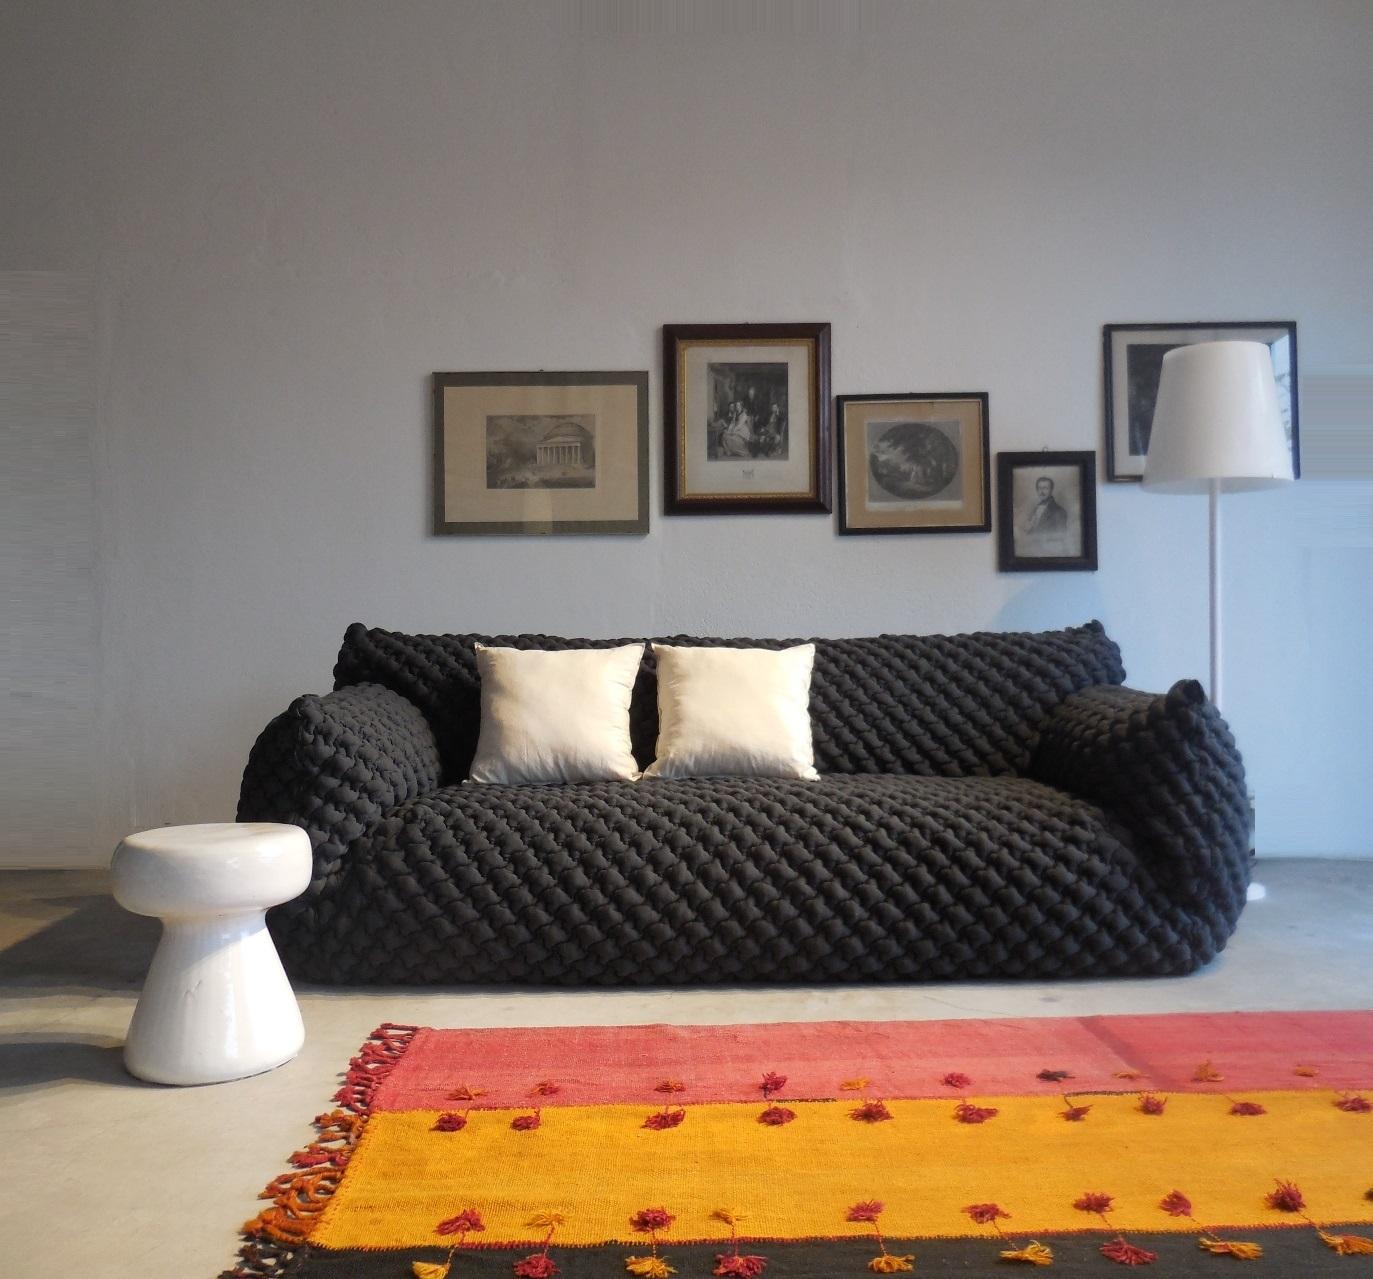 Divano gervasoni divano nuvola gervasoni vendita online for Vendita online divani